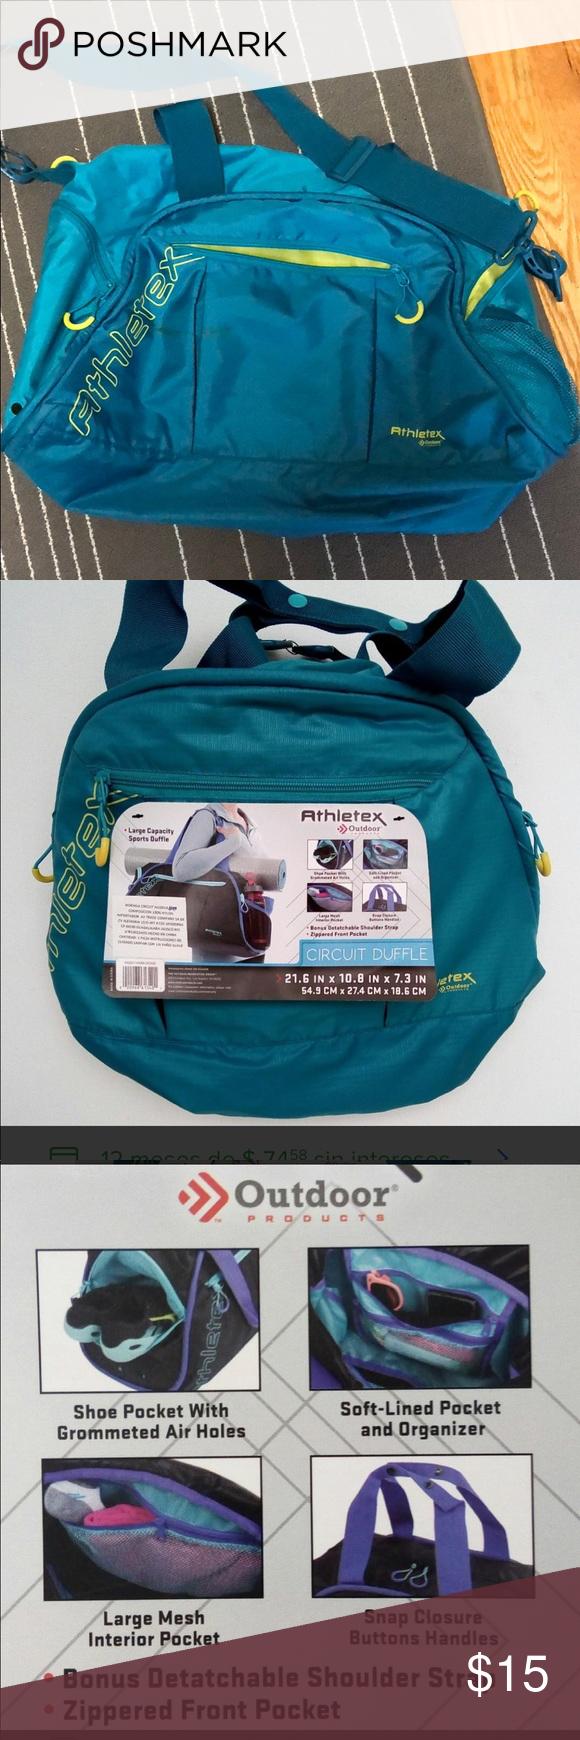 27b8adecb8ab Athletex outdoor yoga bag - used Buy 4 items